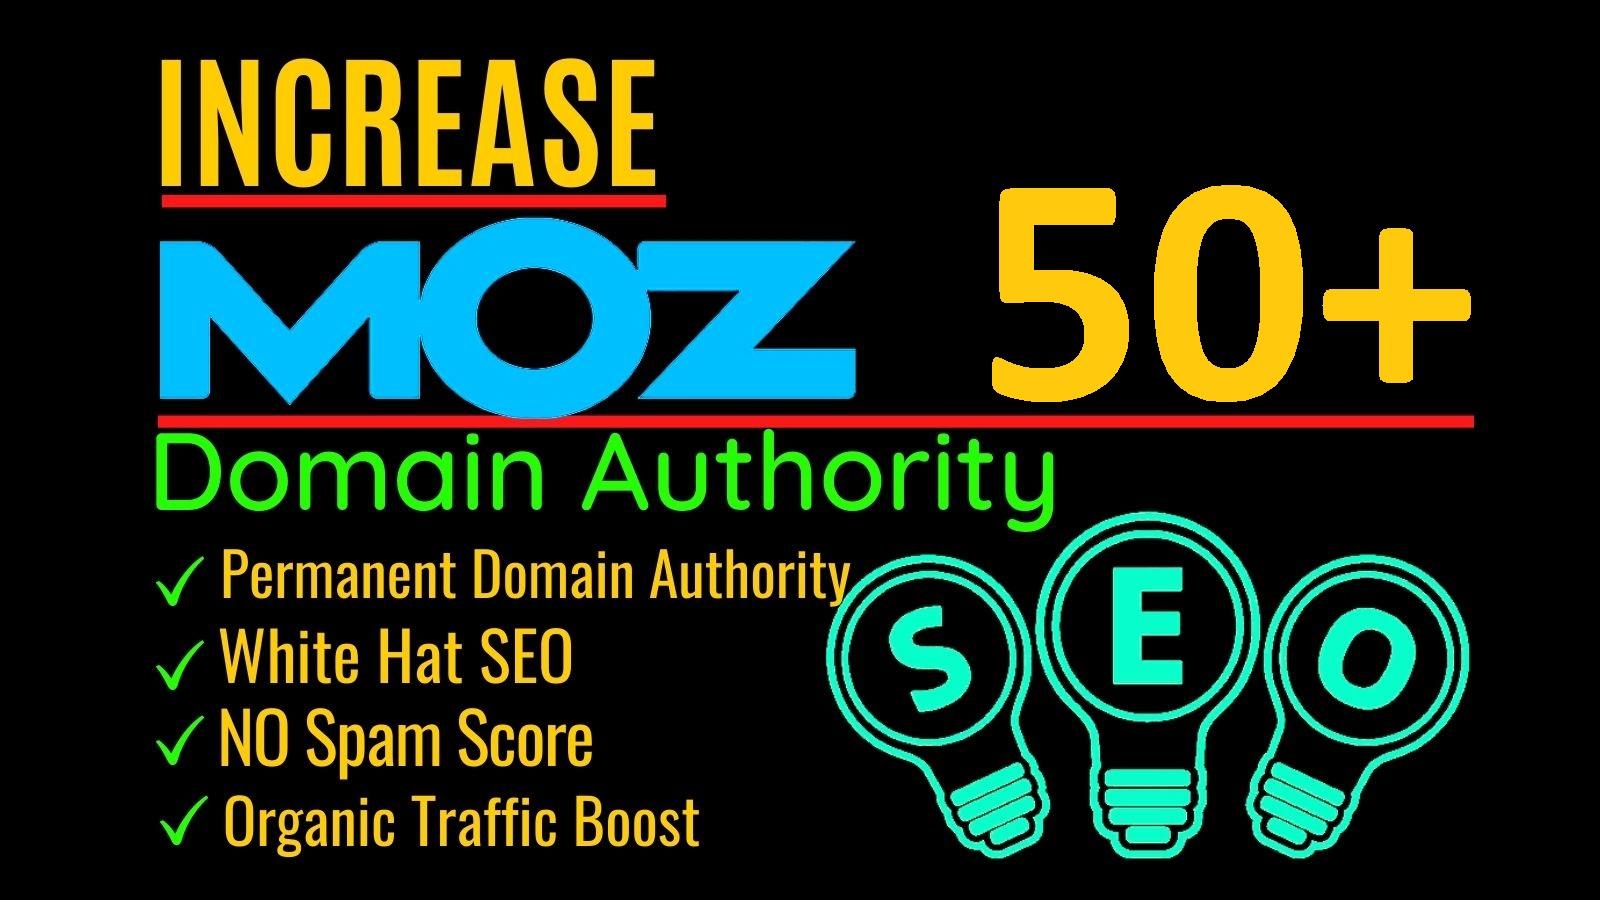 increase moz da domain authority up to 50 plus